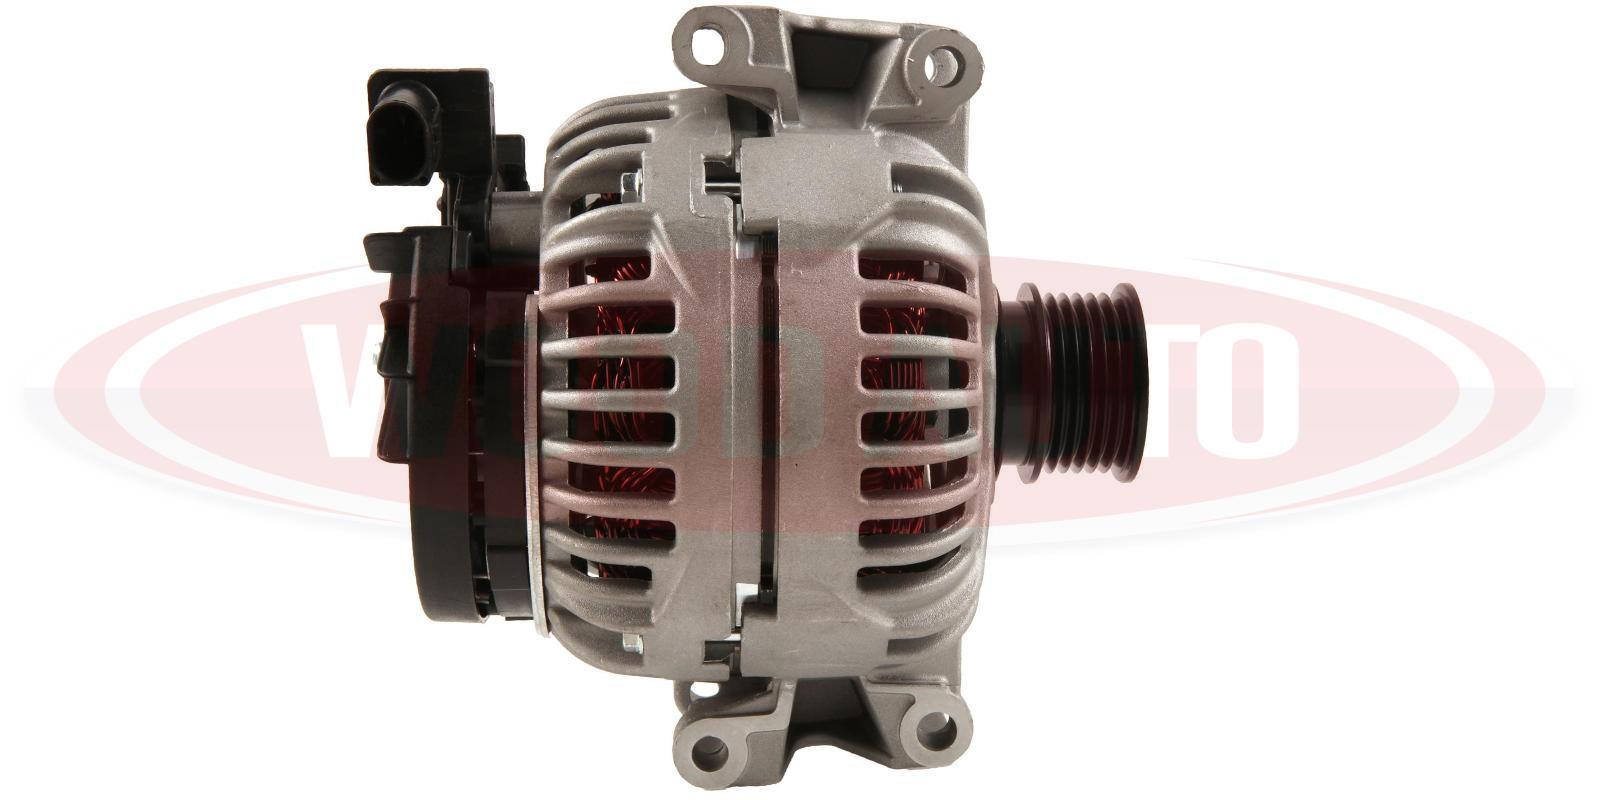 Bosch 0124 525 054 alternator 150amp w203